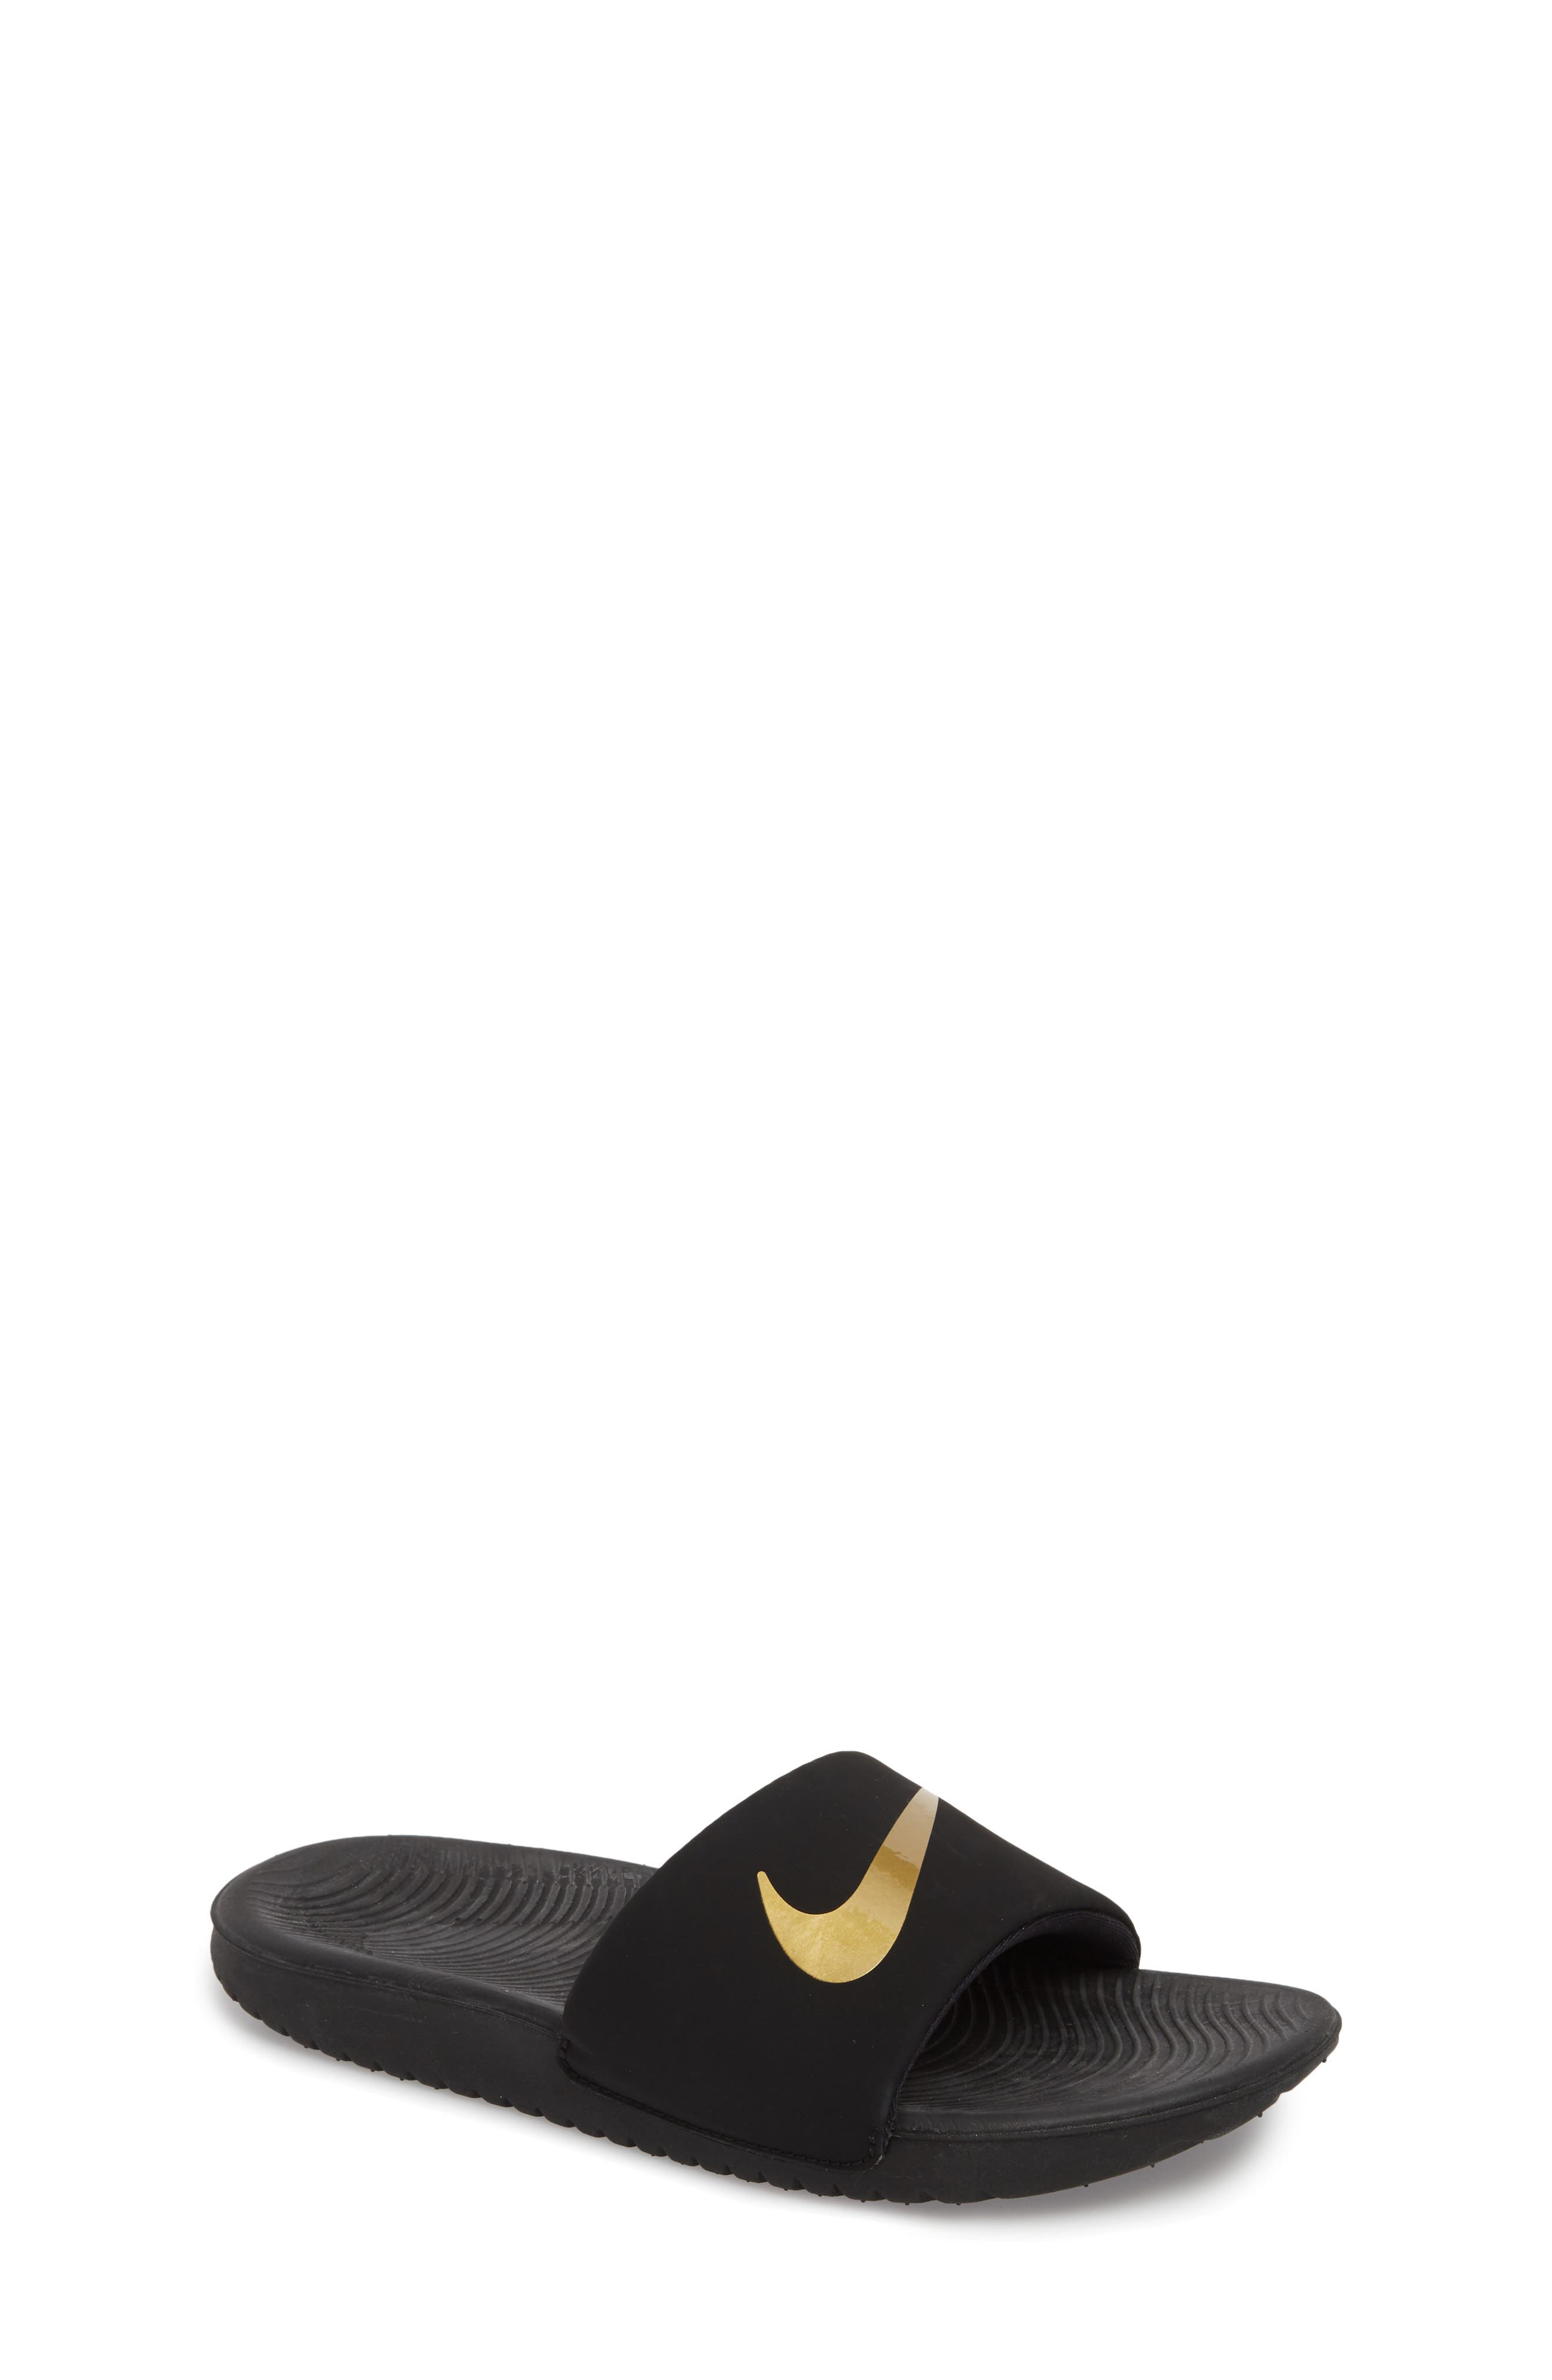 3e02b92d57a5 Boys  Nike Sandals  Flip-Flop